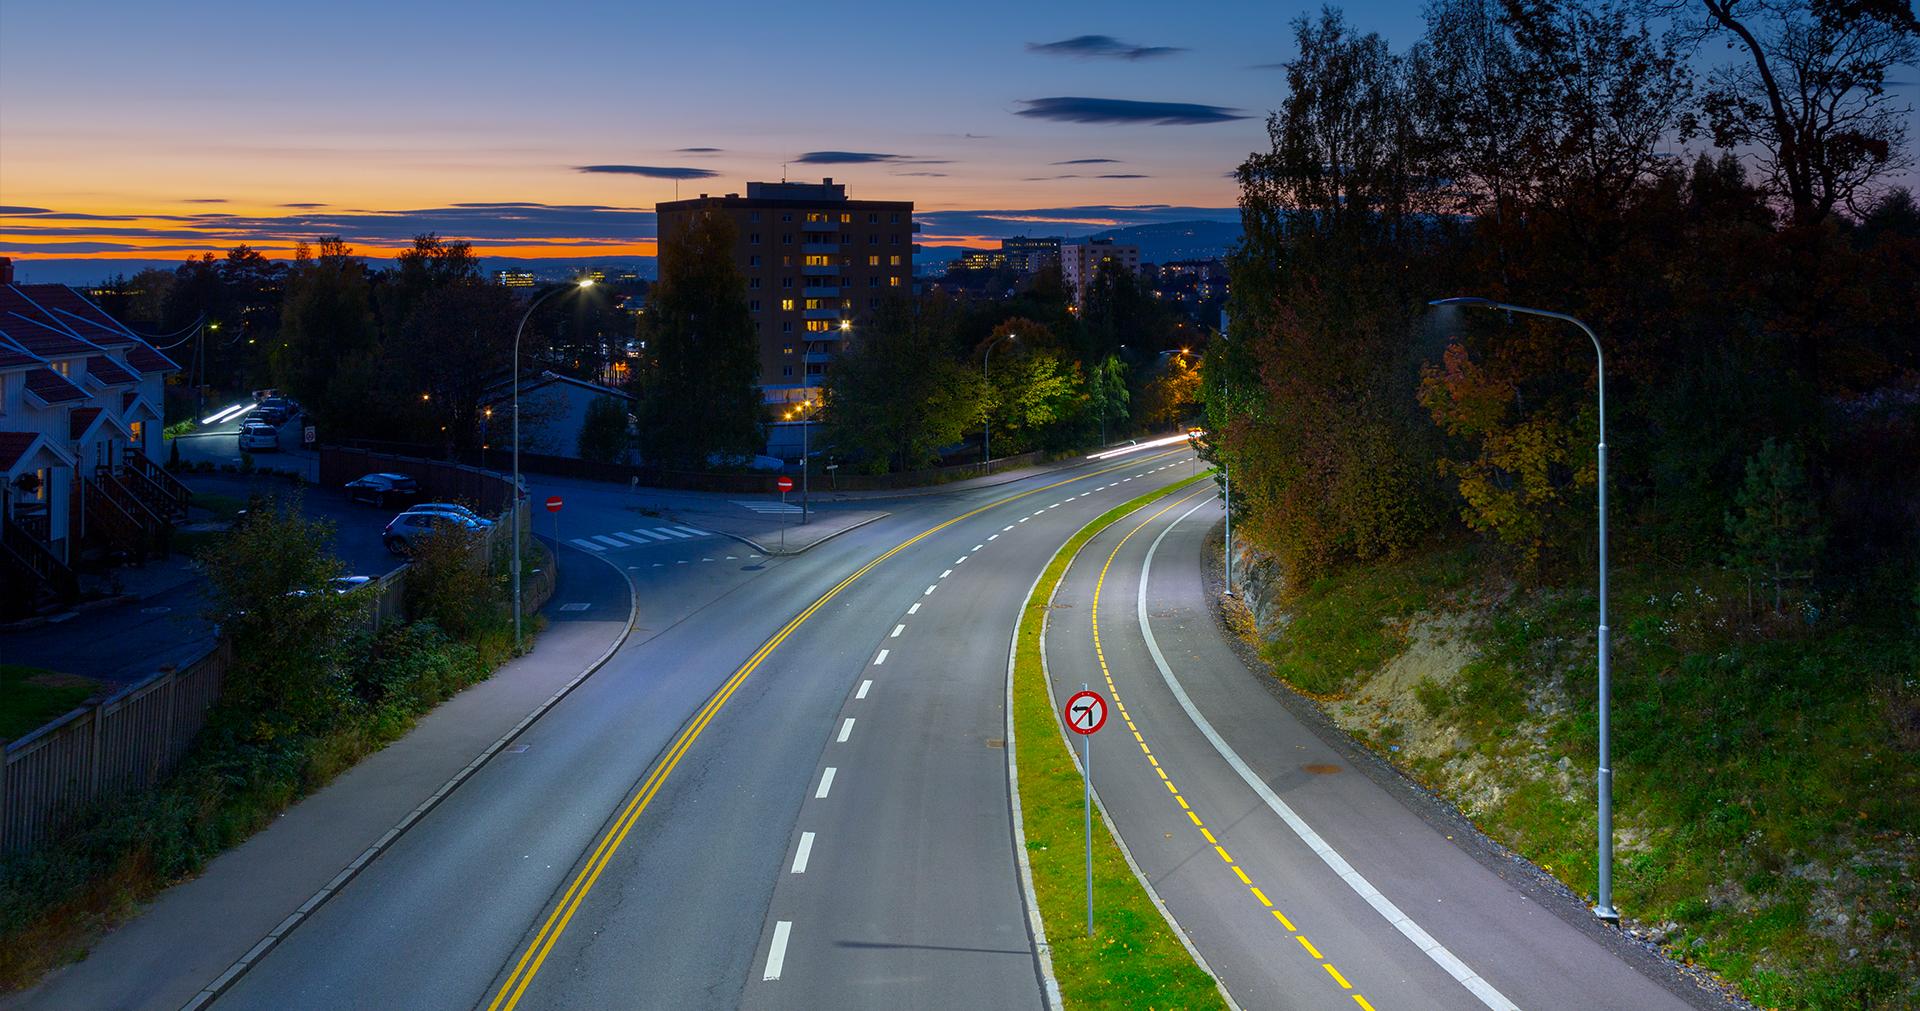 Lampione stradale LED